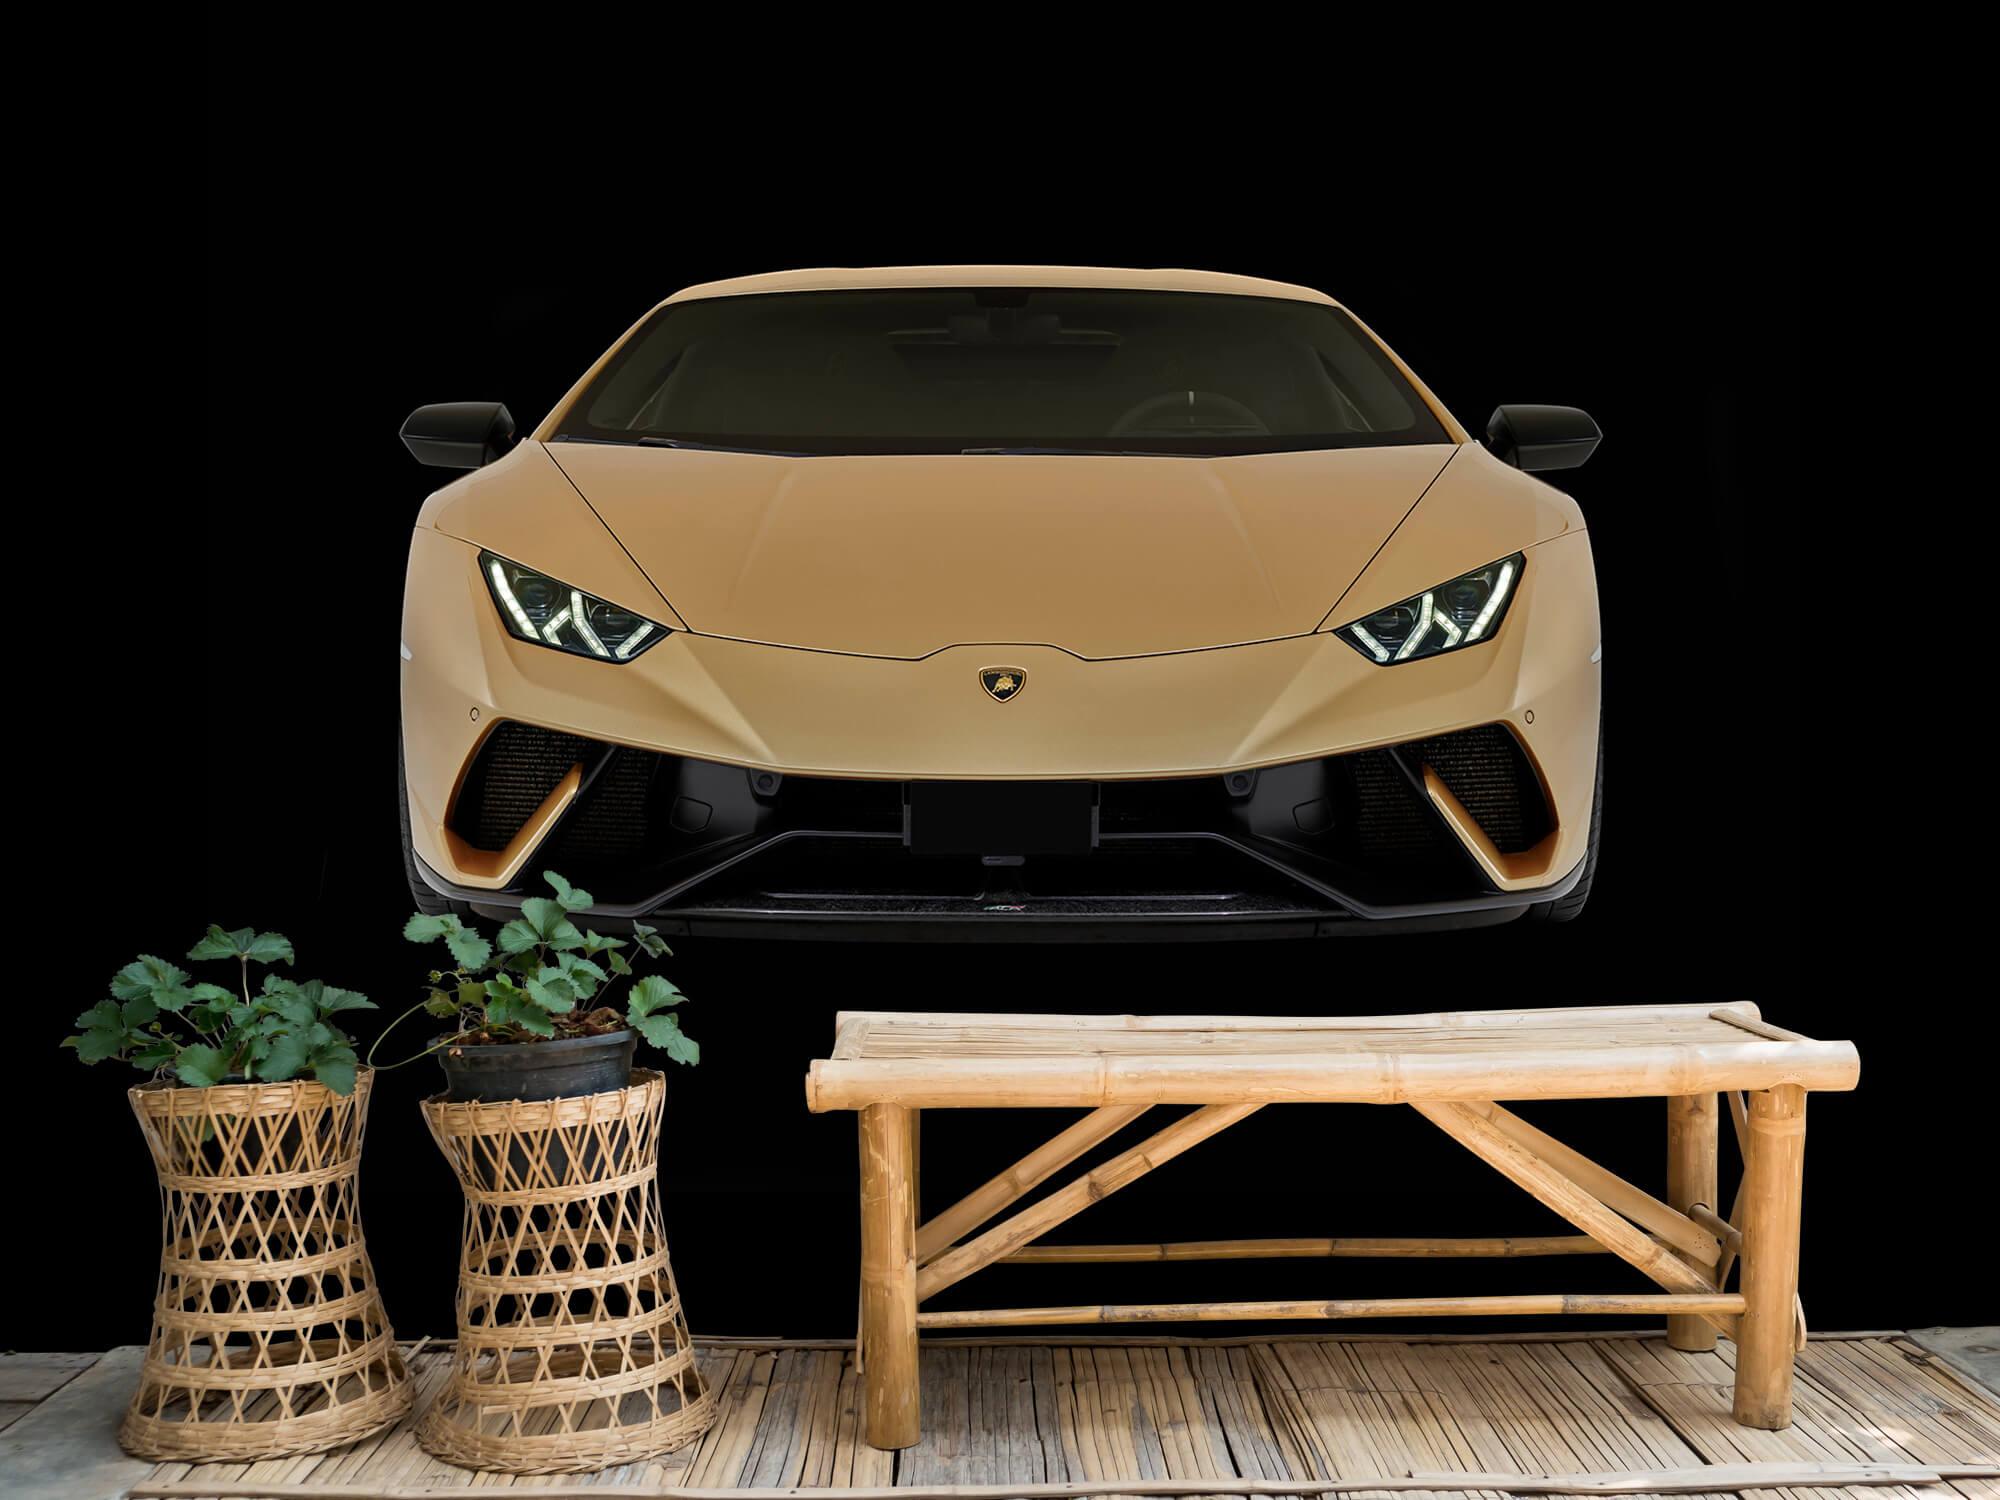 Wallpaper Lamborghini Huracán - Voorkant, zwart 5